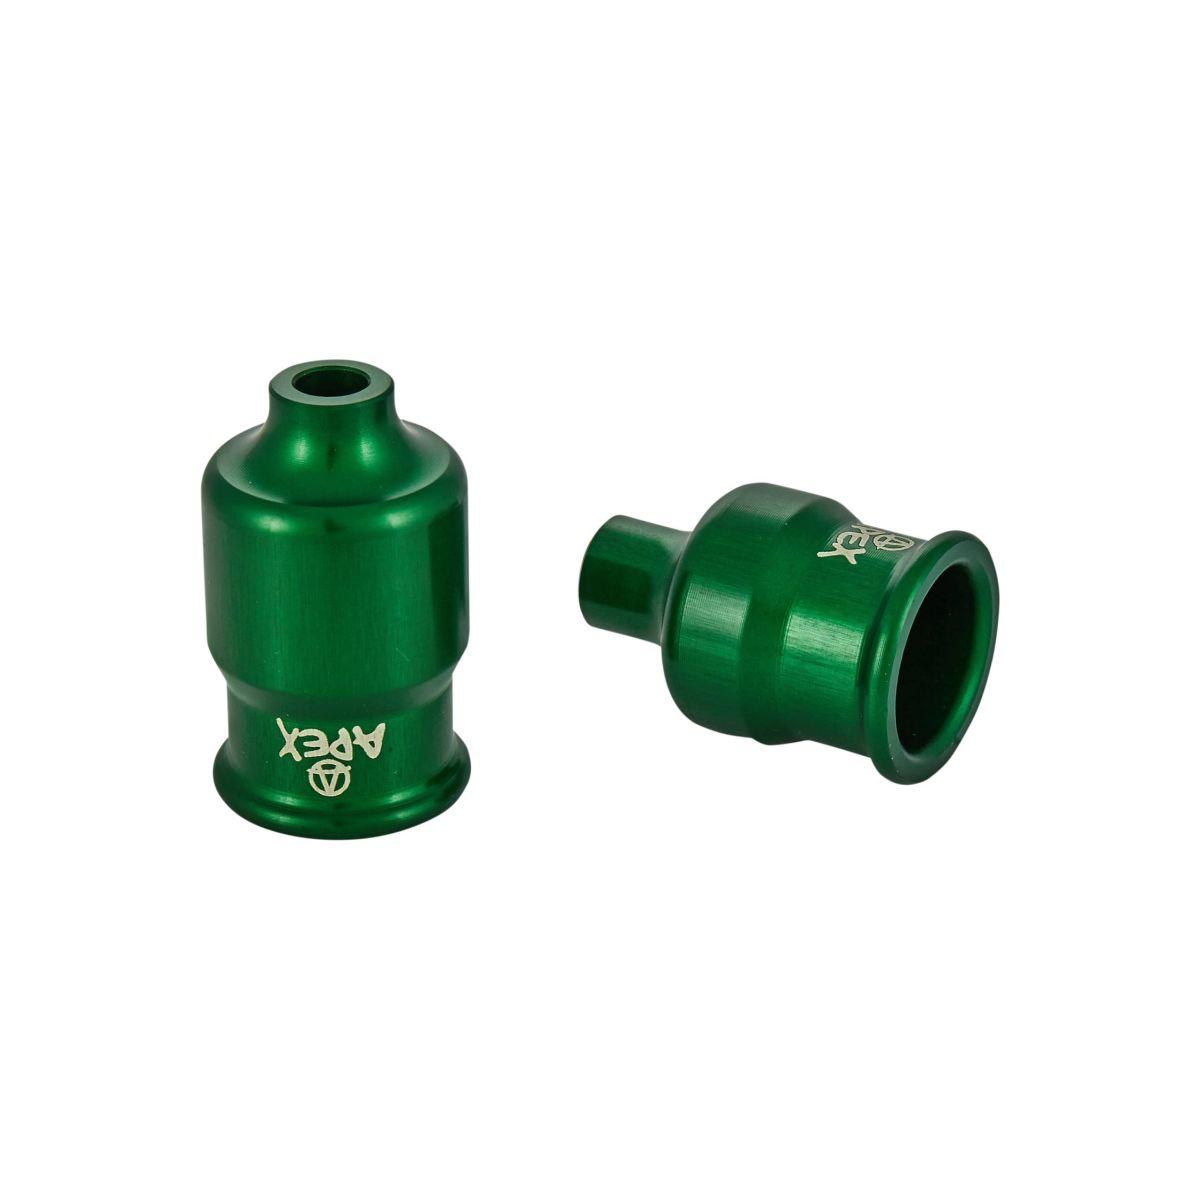 Pegi Apex Coopegs Green